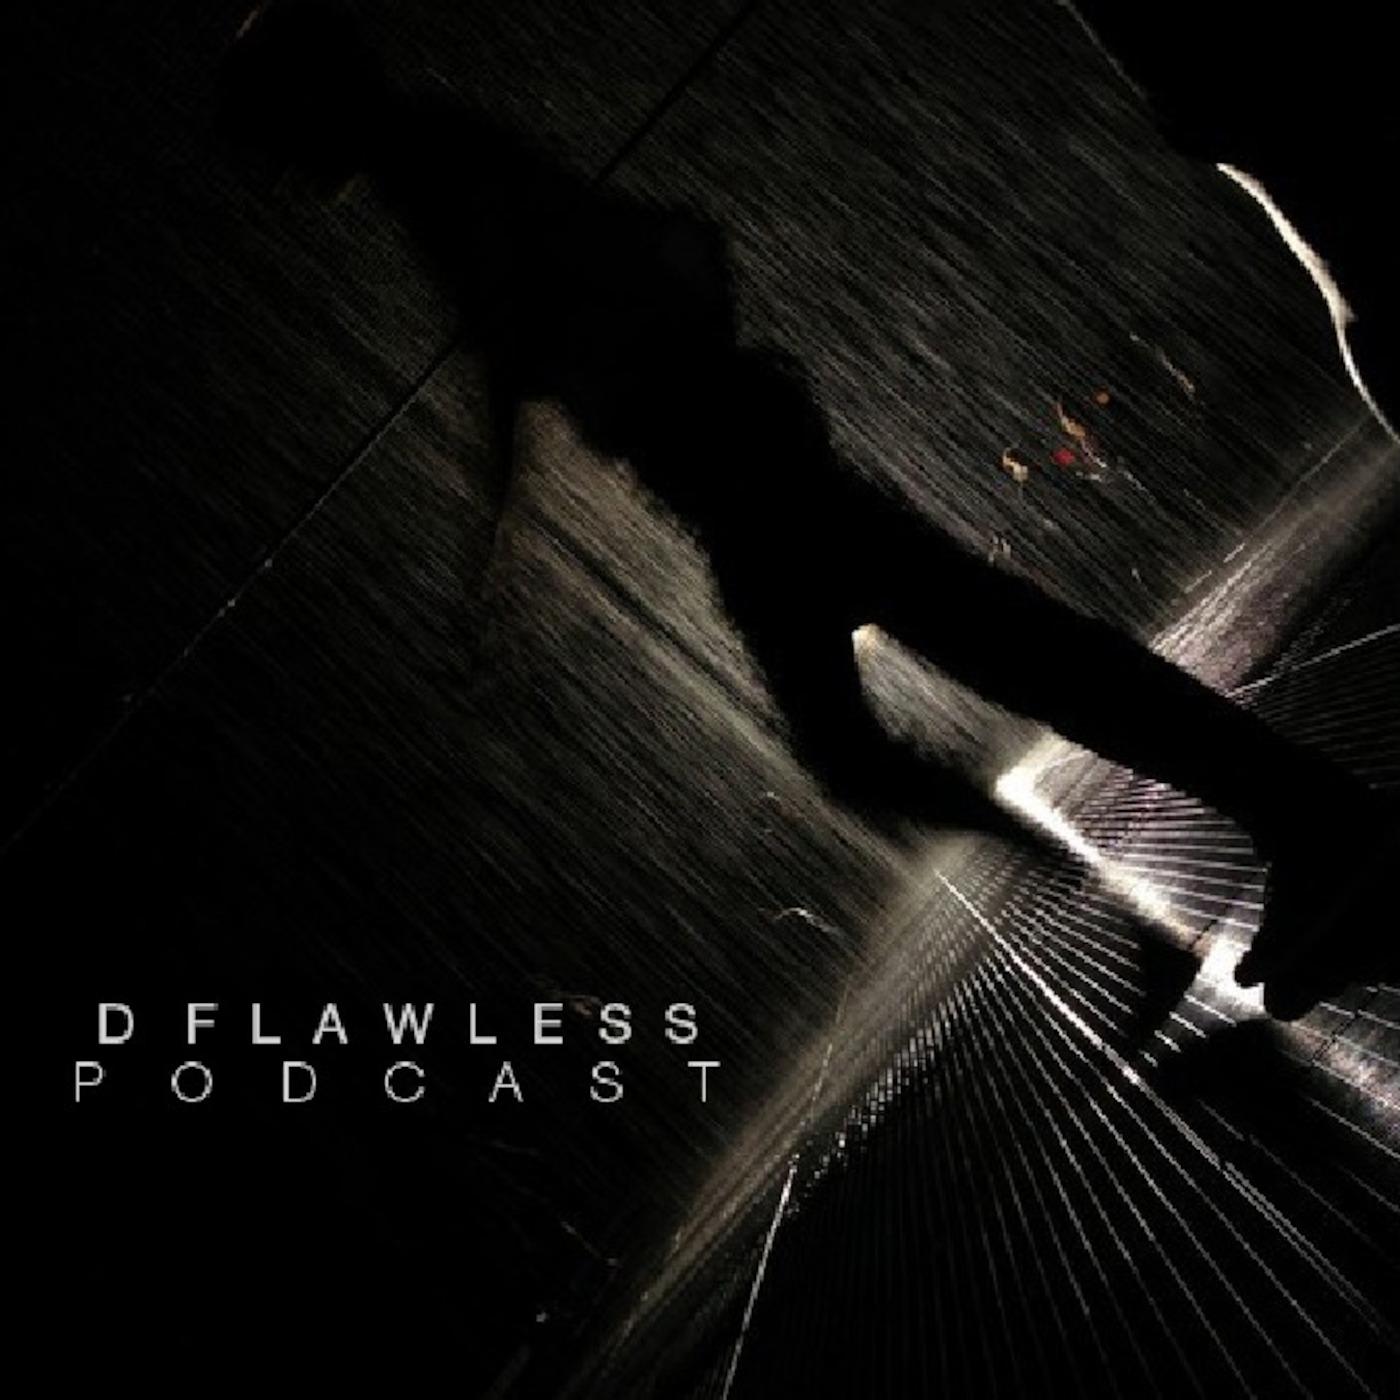 D Flawless